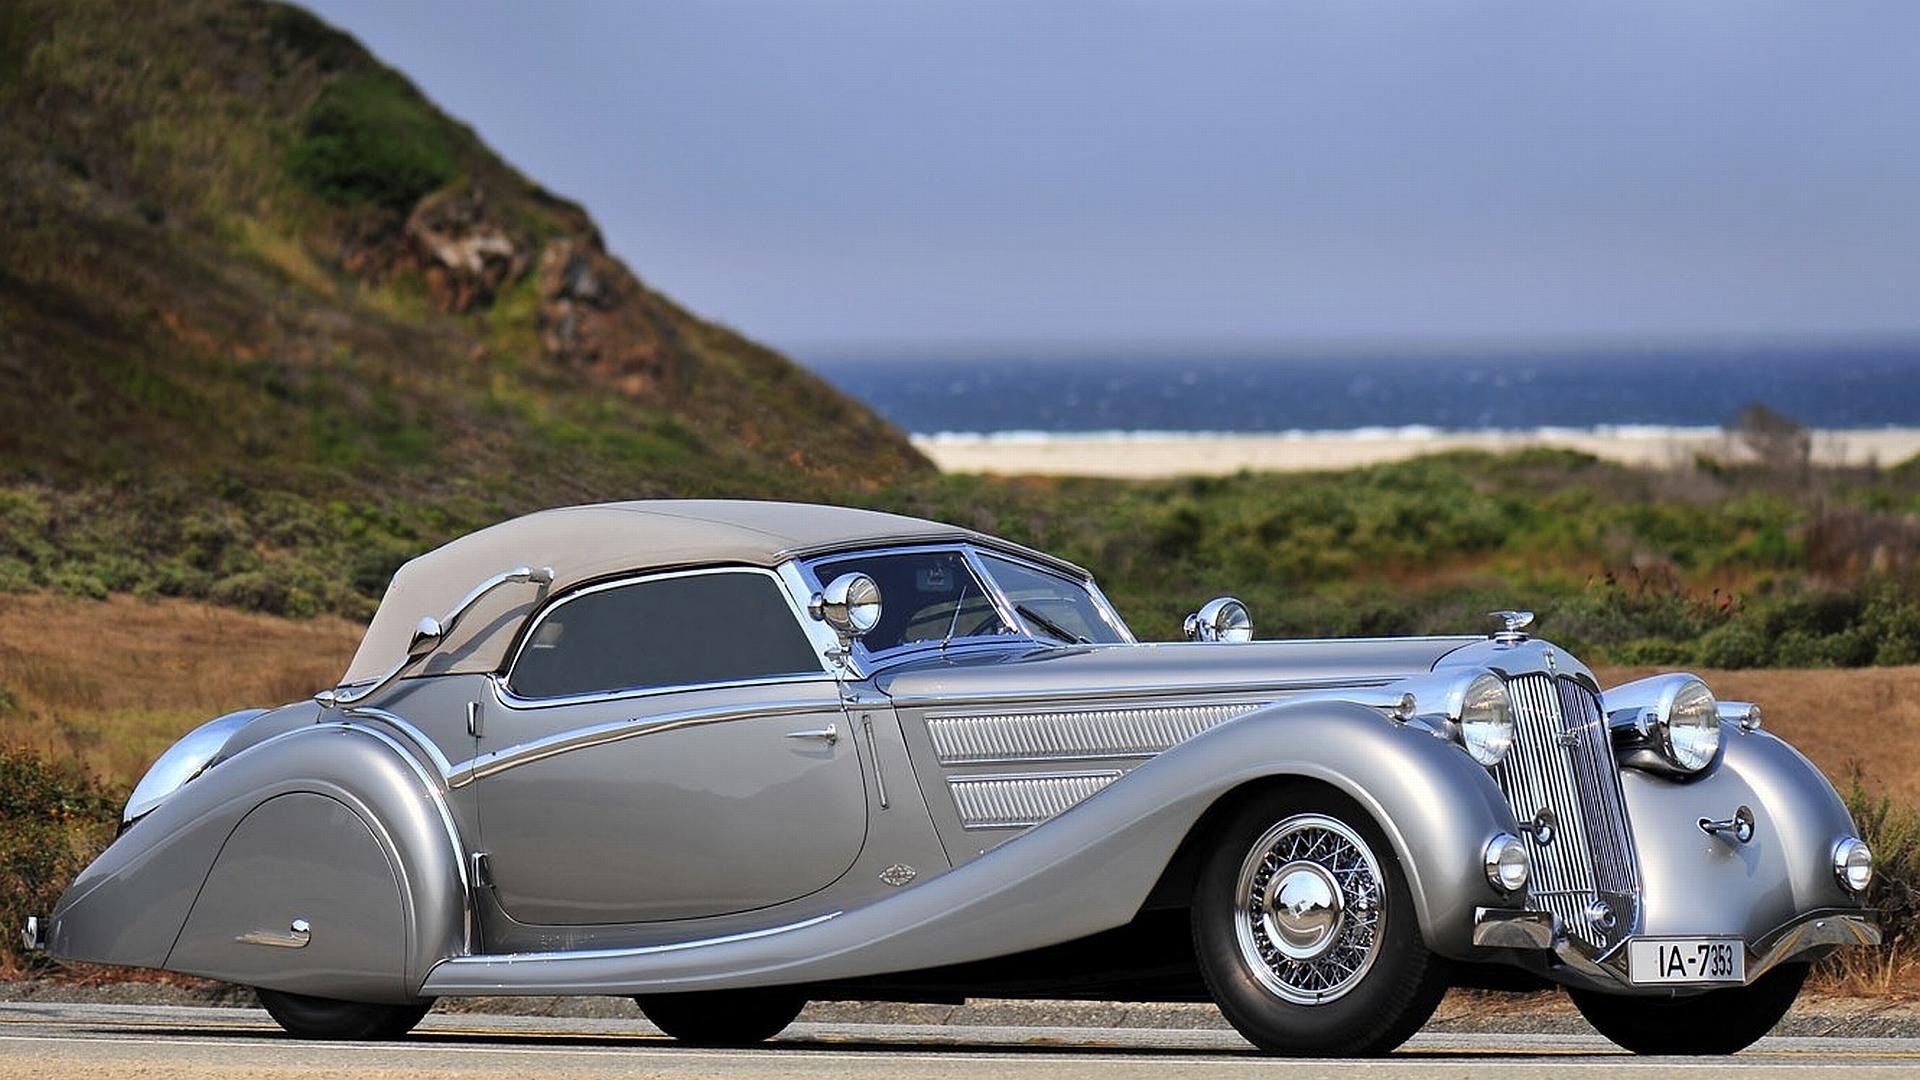 General 1920x1080 car Oldtimer oldtimers numbers vehicle silver cars